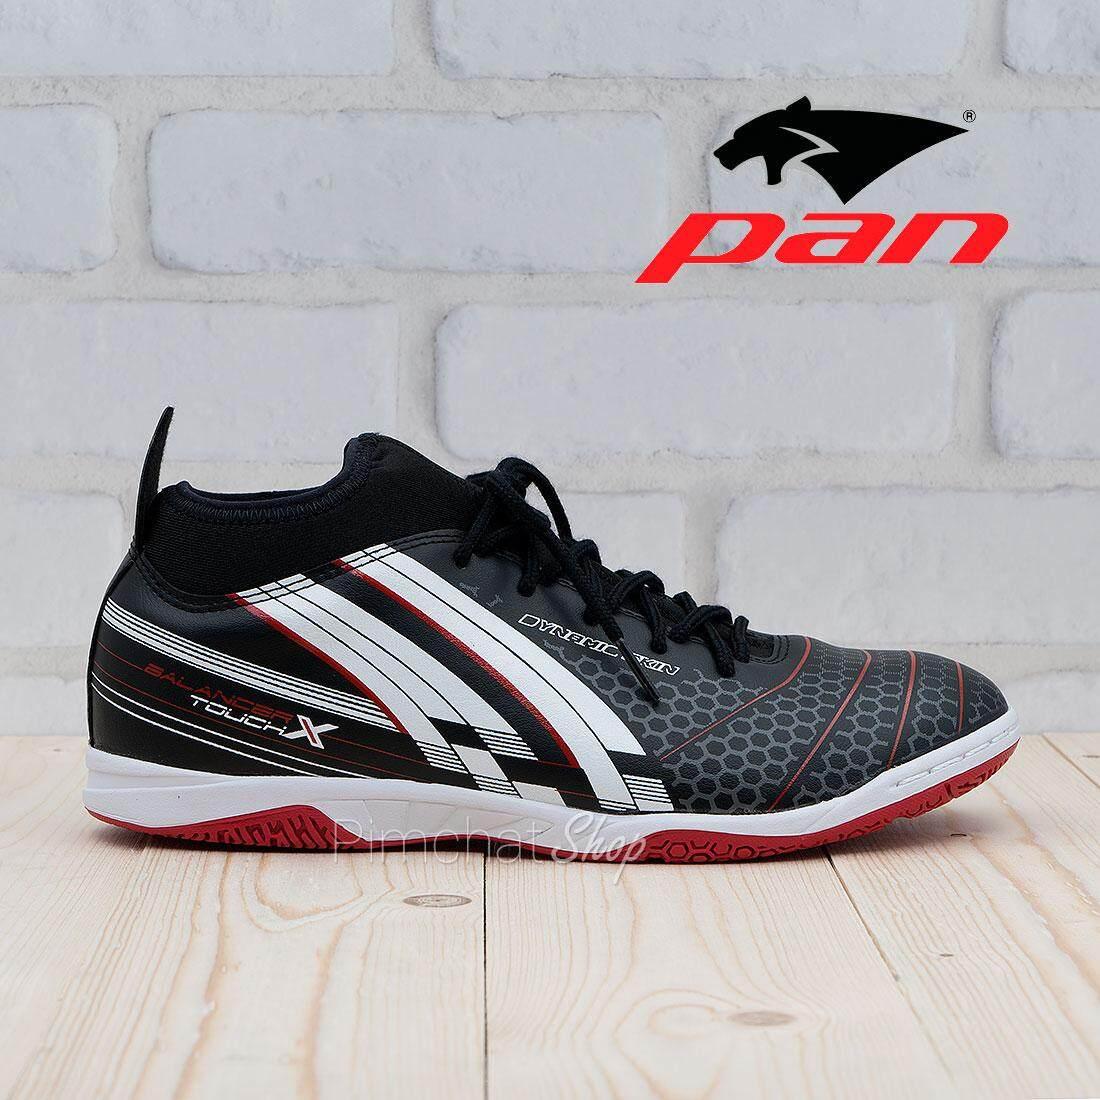 5b5d255e60 PAN รองเท้าฟุตซอล รองเท้ากีฬา Balancer Touch X PF14W3 (สีดำ)